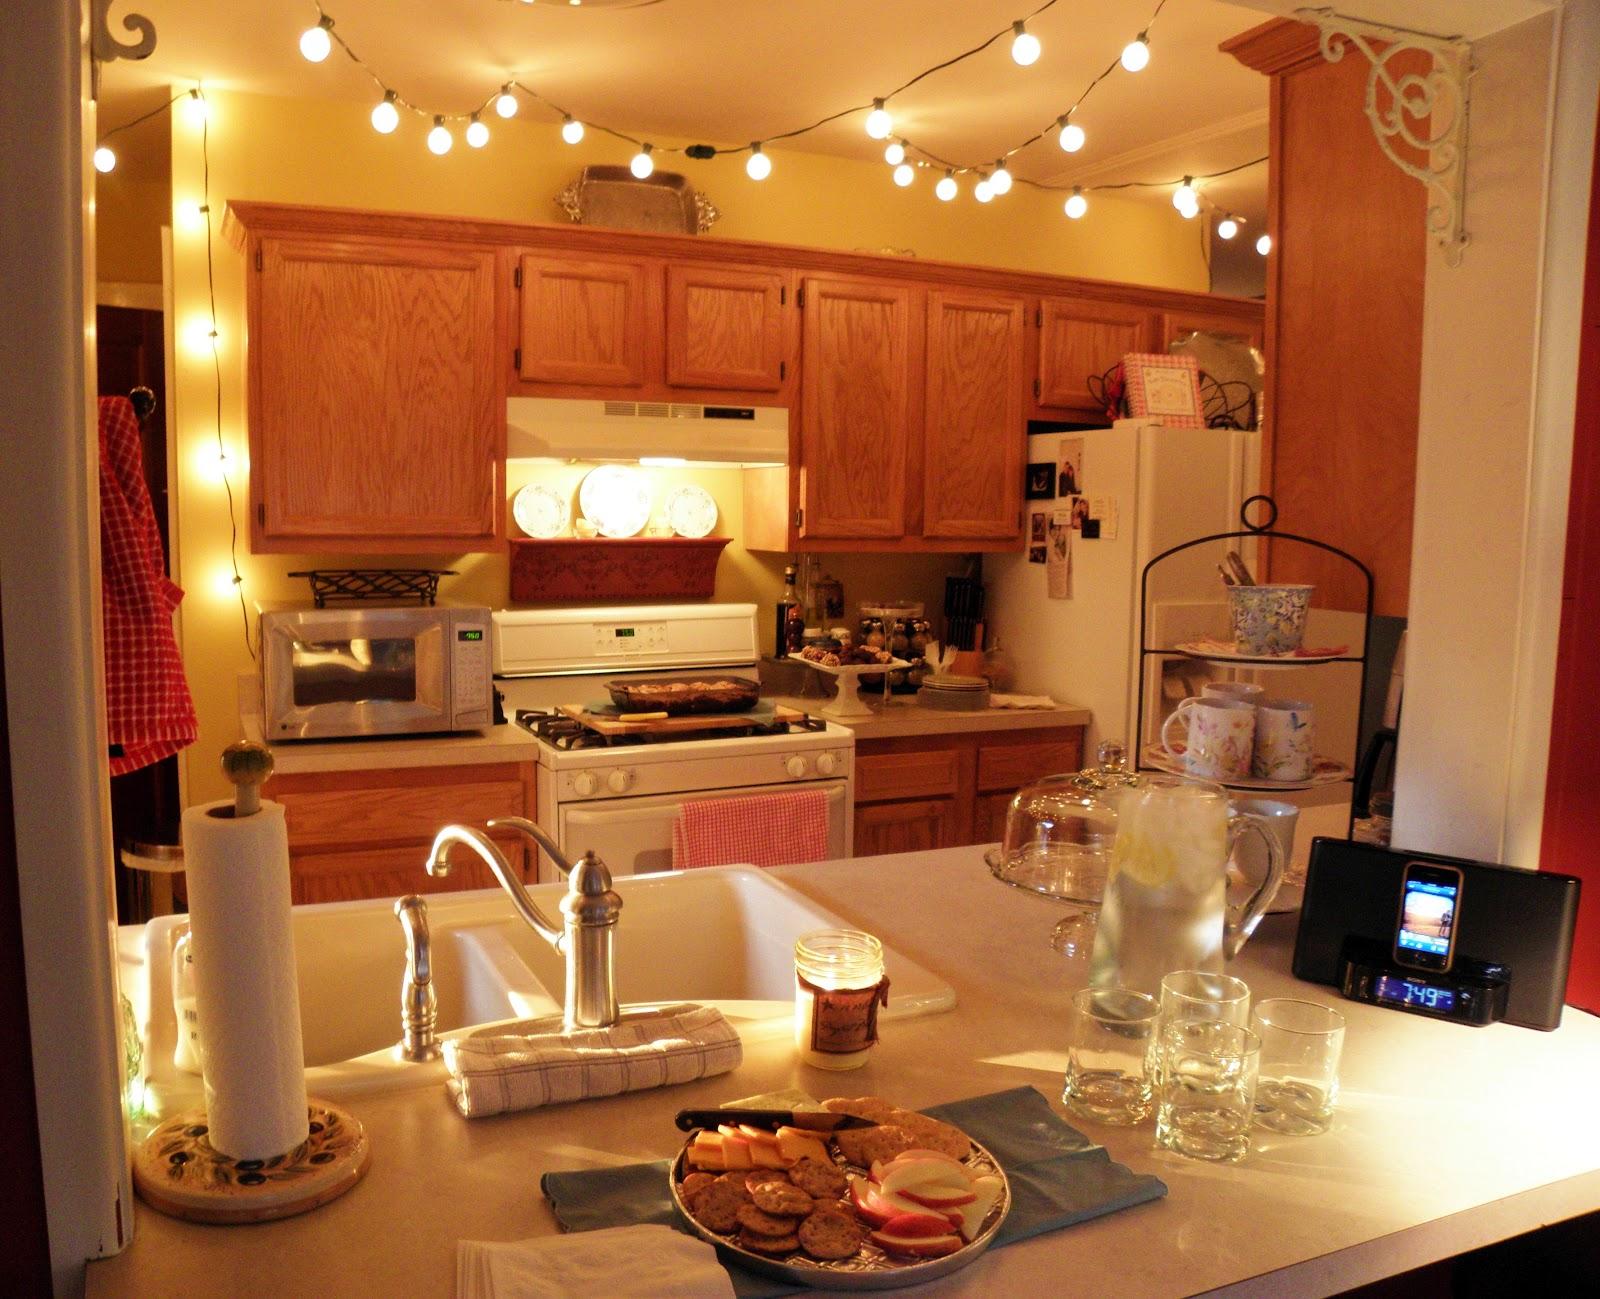 Little Kitchen The Cozy Little Kitchen Irresistable Peanut Butter Graham Cracker